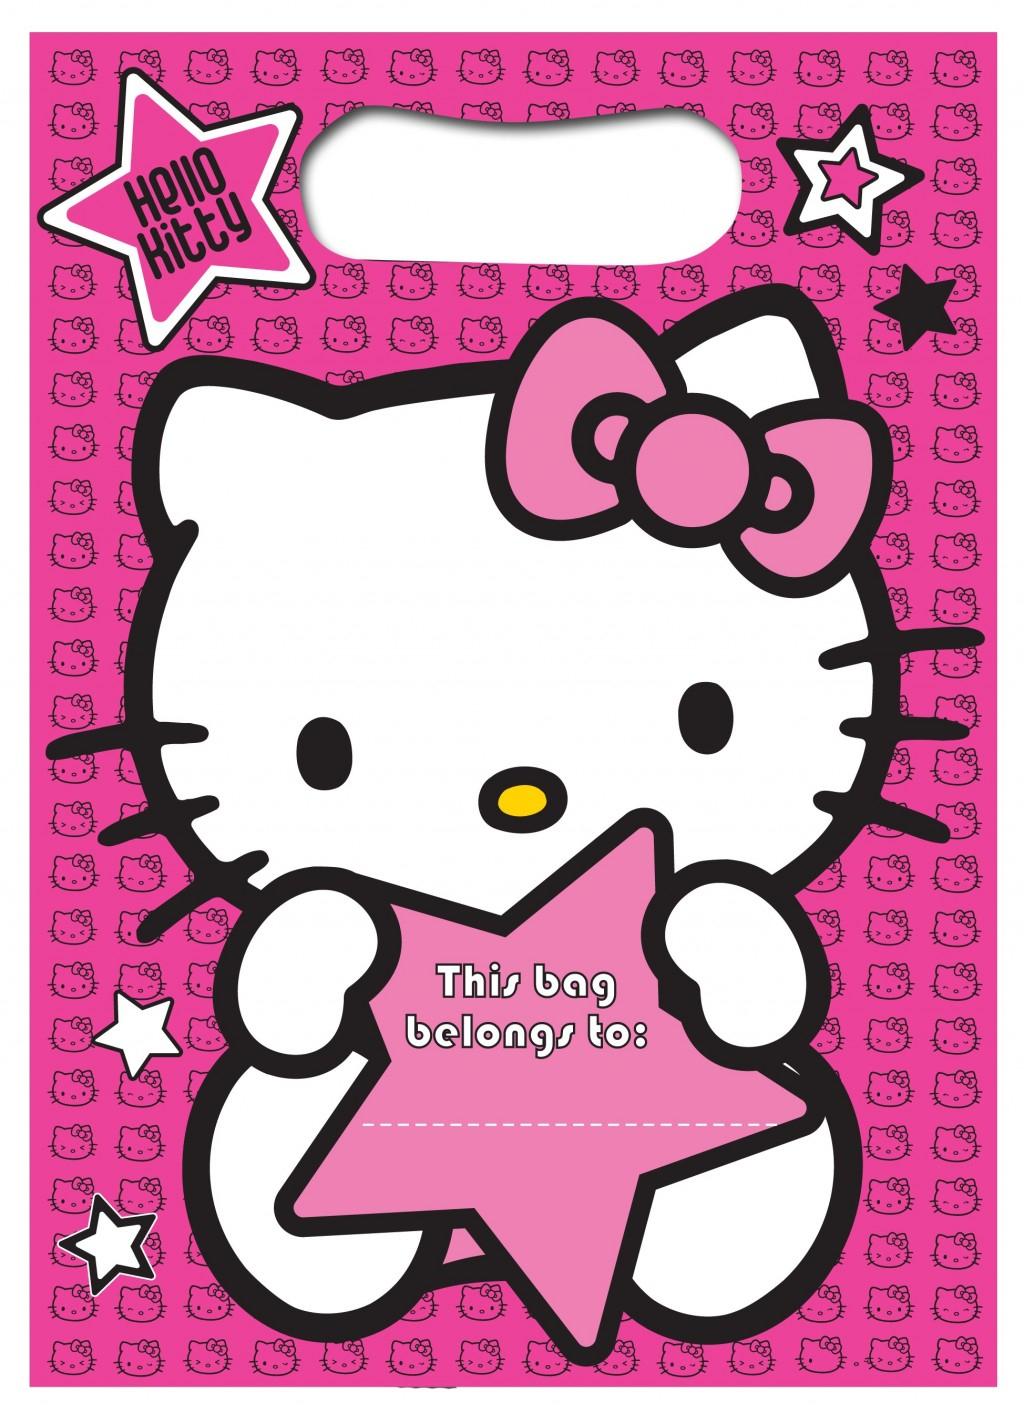 Photo : Hello Kitty And Puppy Baby Image - Free Printable Hello Kitty Baby Shower Invitations